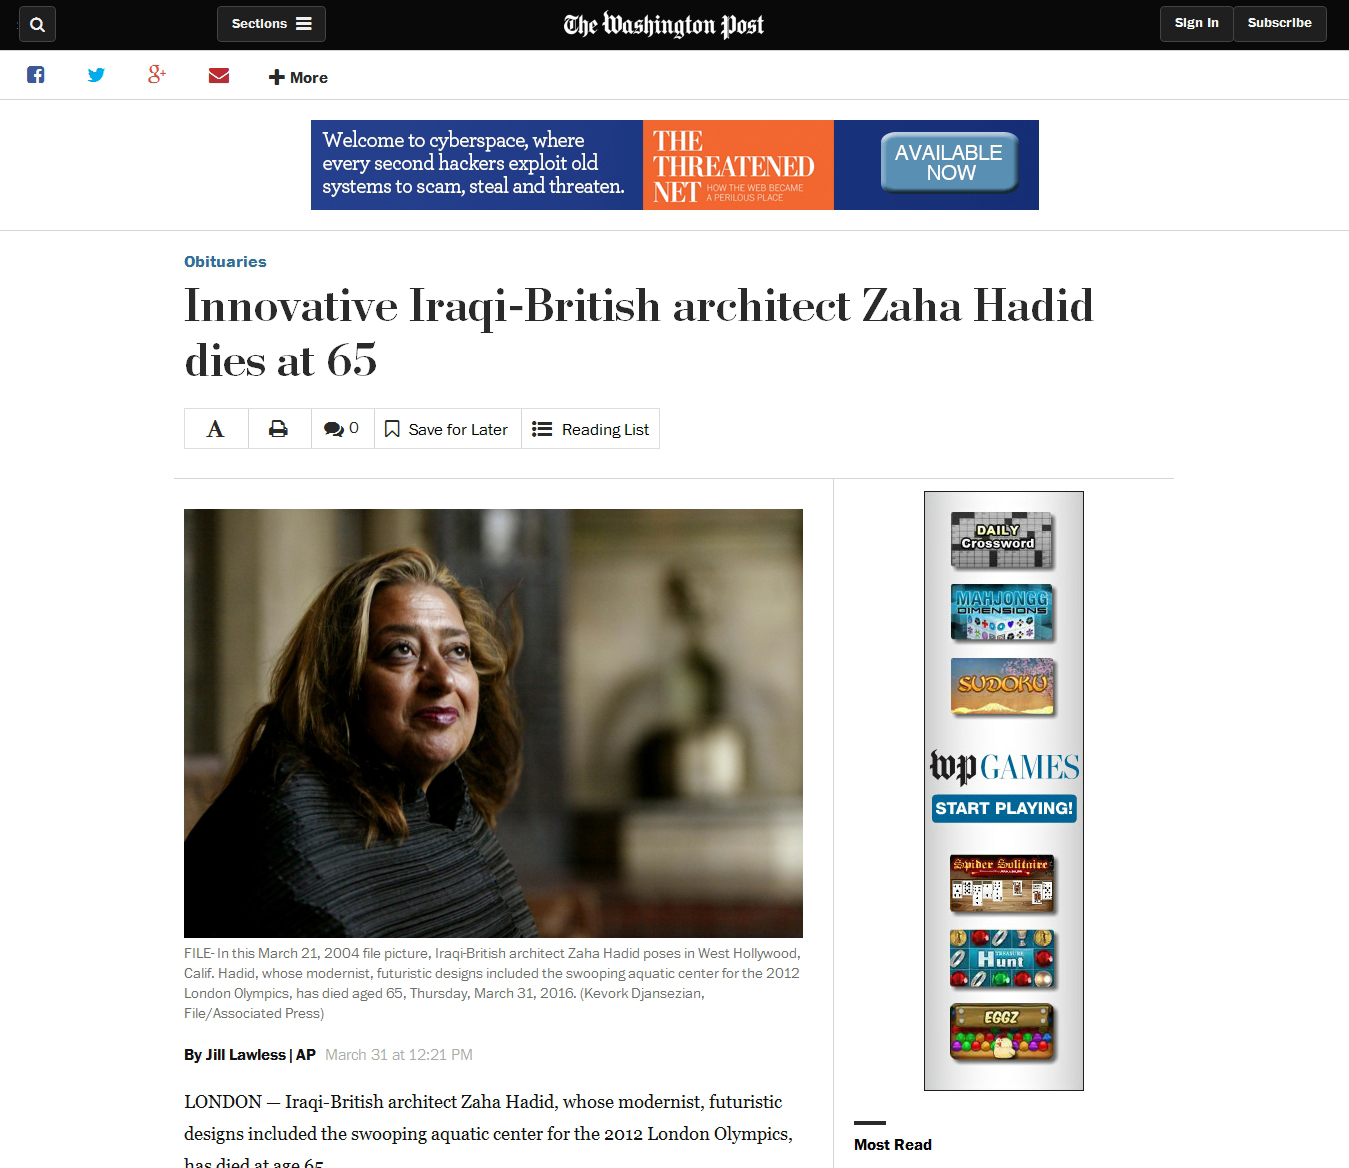 Innovative Iraqi-British architect Zaha Hadid dies at 65 - The Washington Post